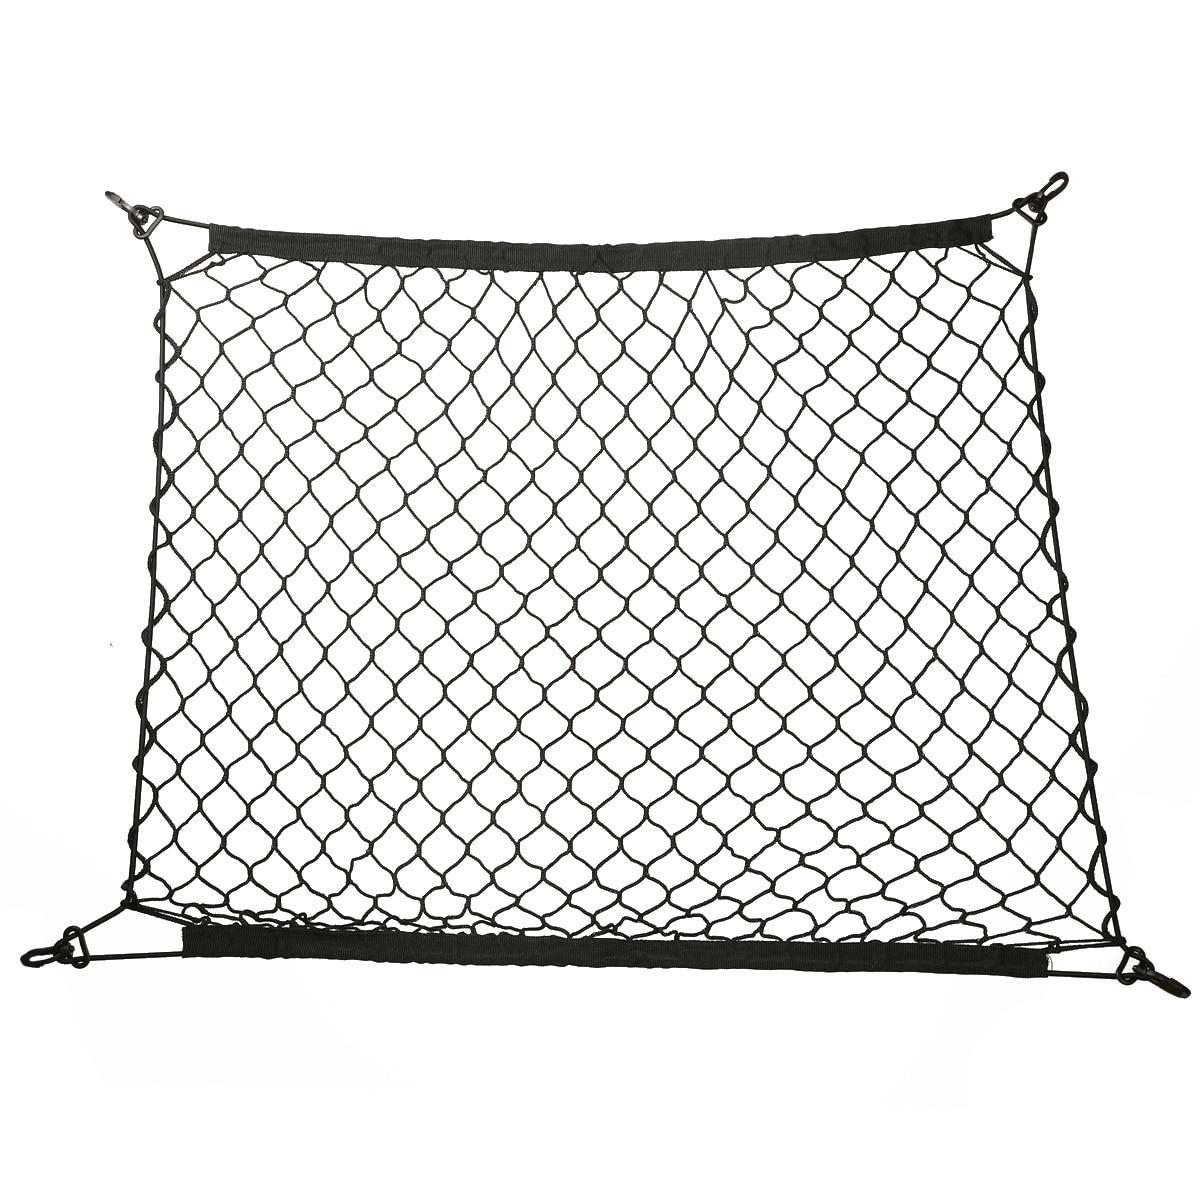 Auto Care 70 x 70cm Universal Car Trunk Luggage Storage Cargo Organizer Nylon Elastic Mesh Net With 4 Plastic Hooks